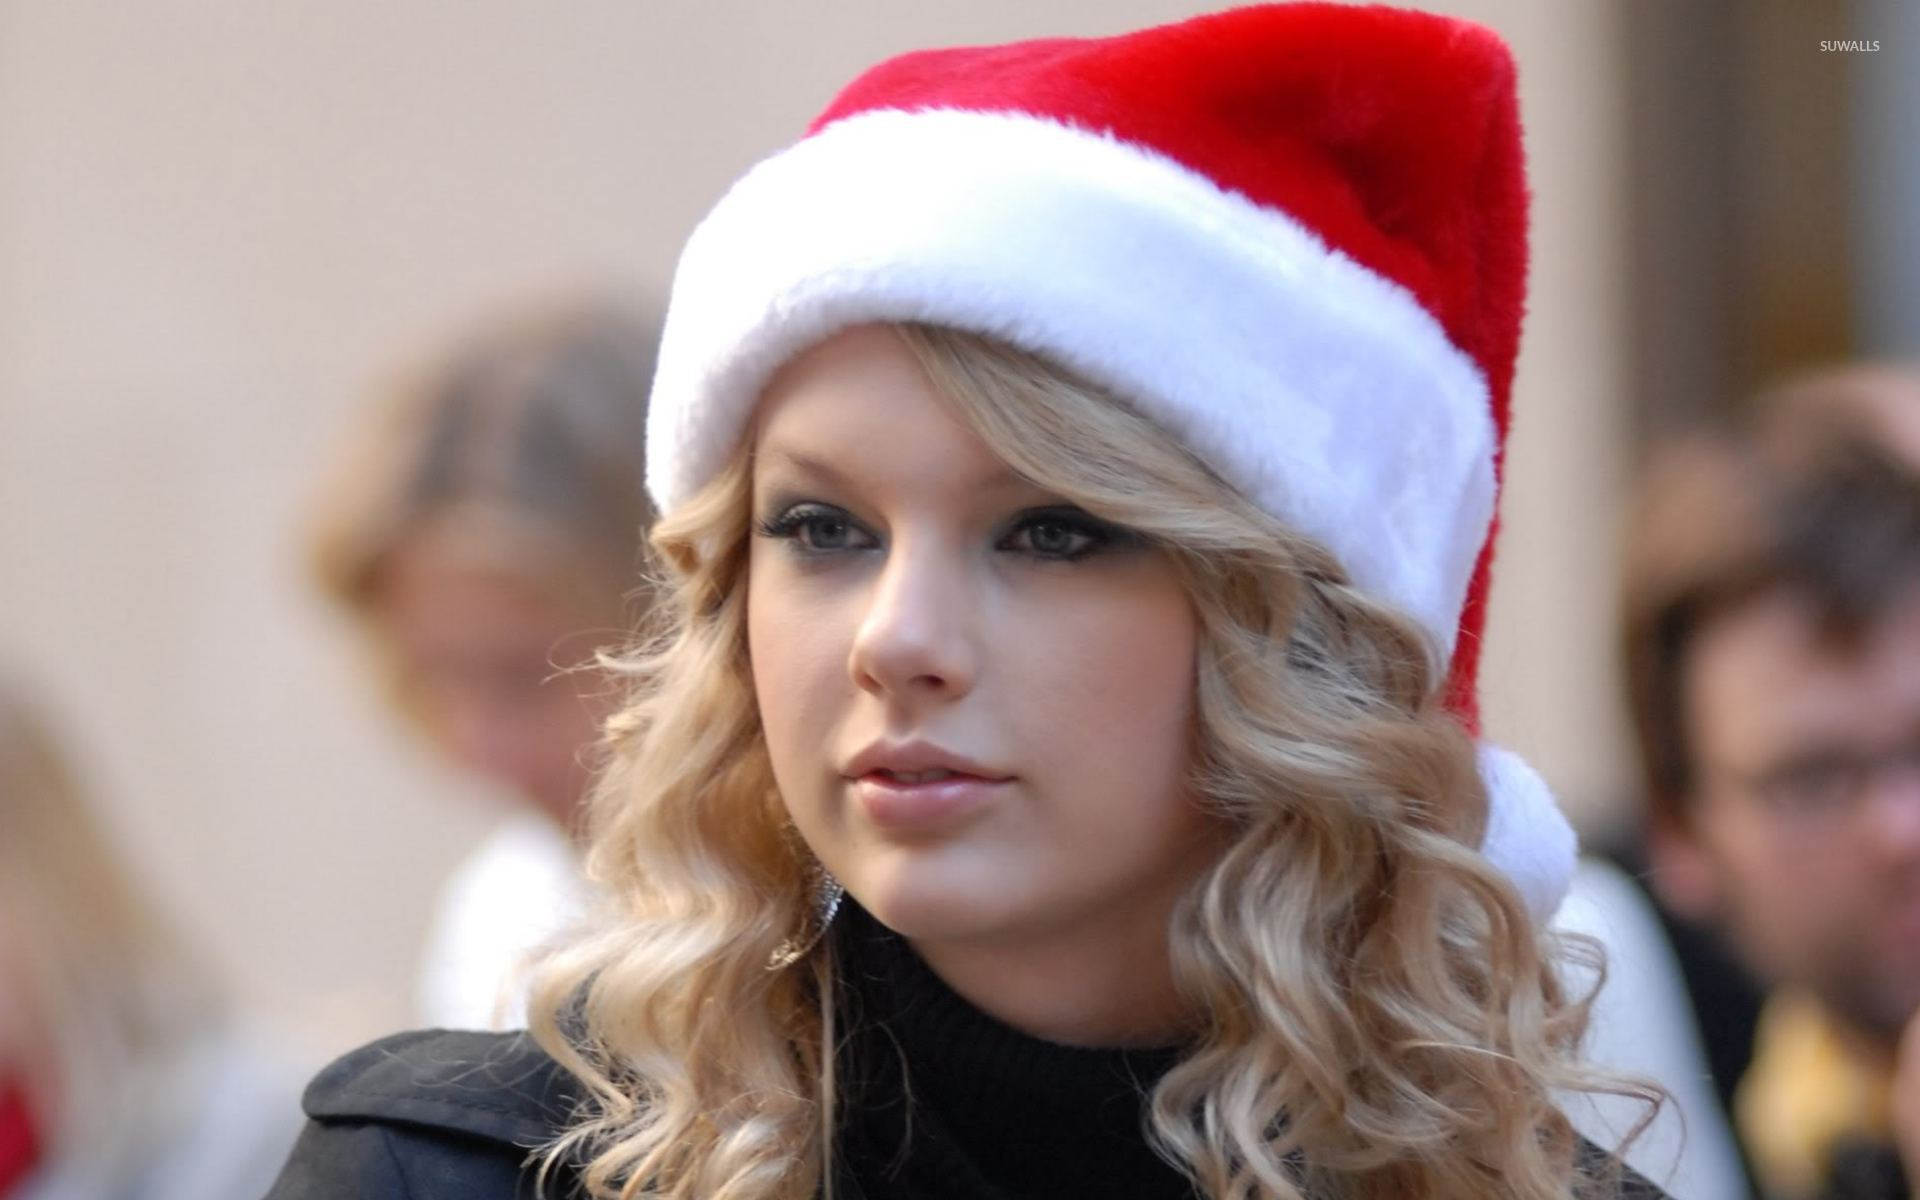 Taylor swift 9 wallpaper celebrity wallpapers 896 taylor swift 9 wallpaper voltagebd Images